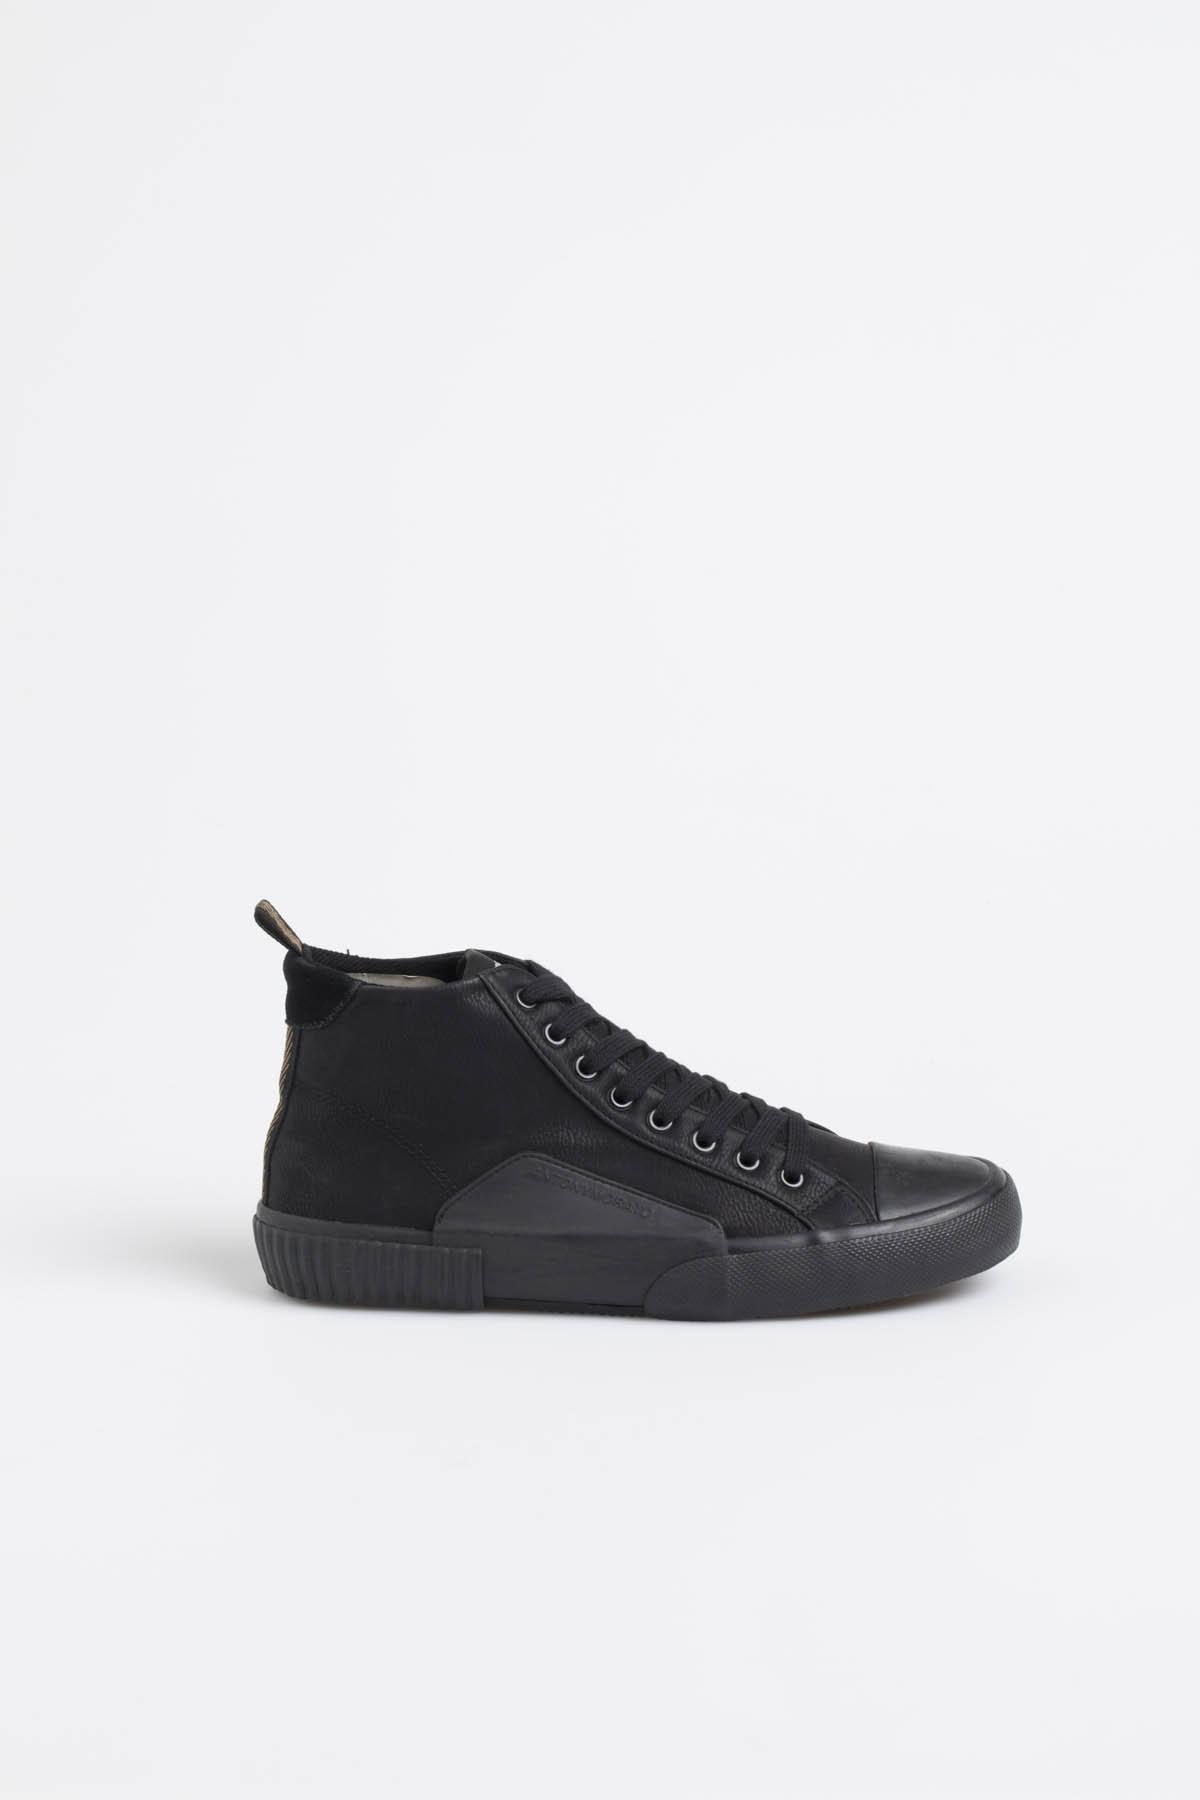 Schuhe für Männer ANTONY MORATO A/I 18-19